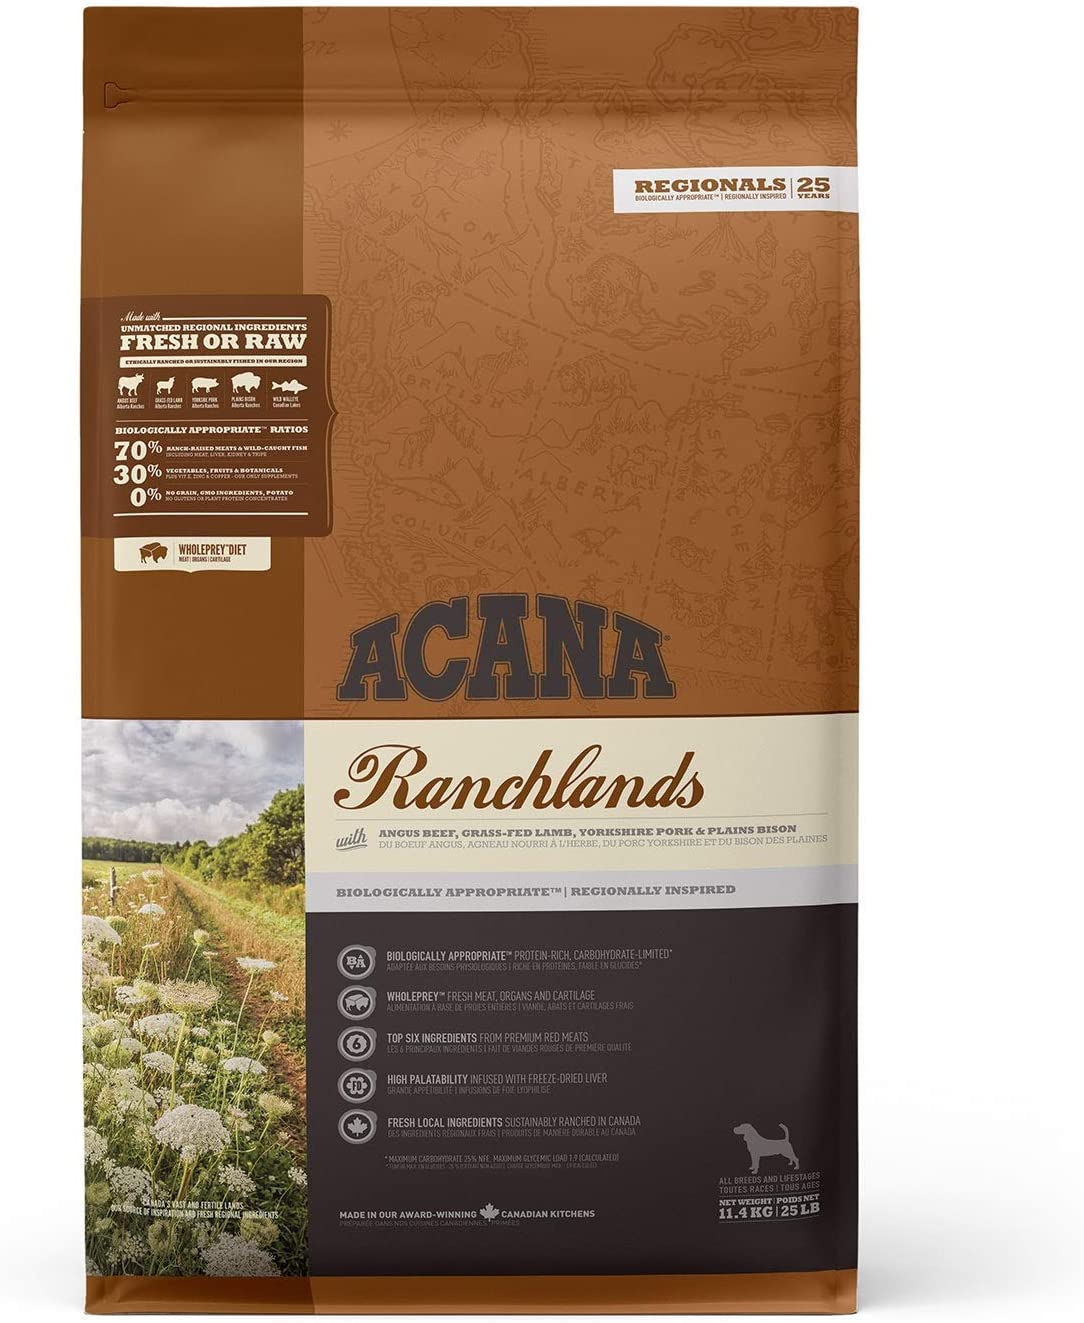 ACANA Ranchlands Comida para Perros - 11400 gr